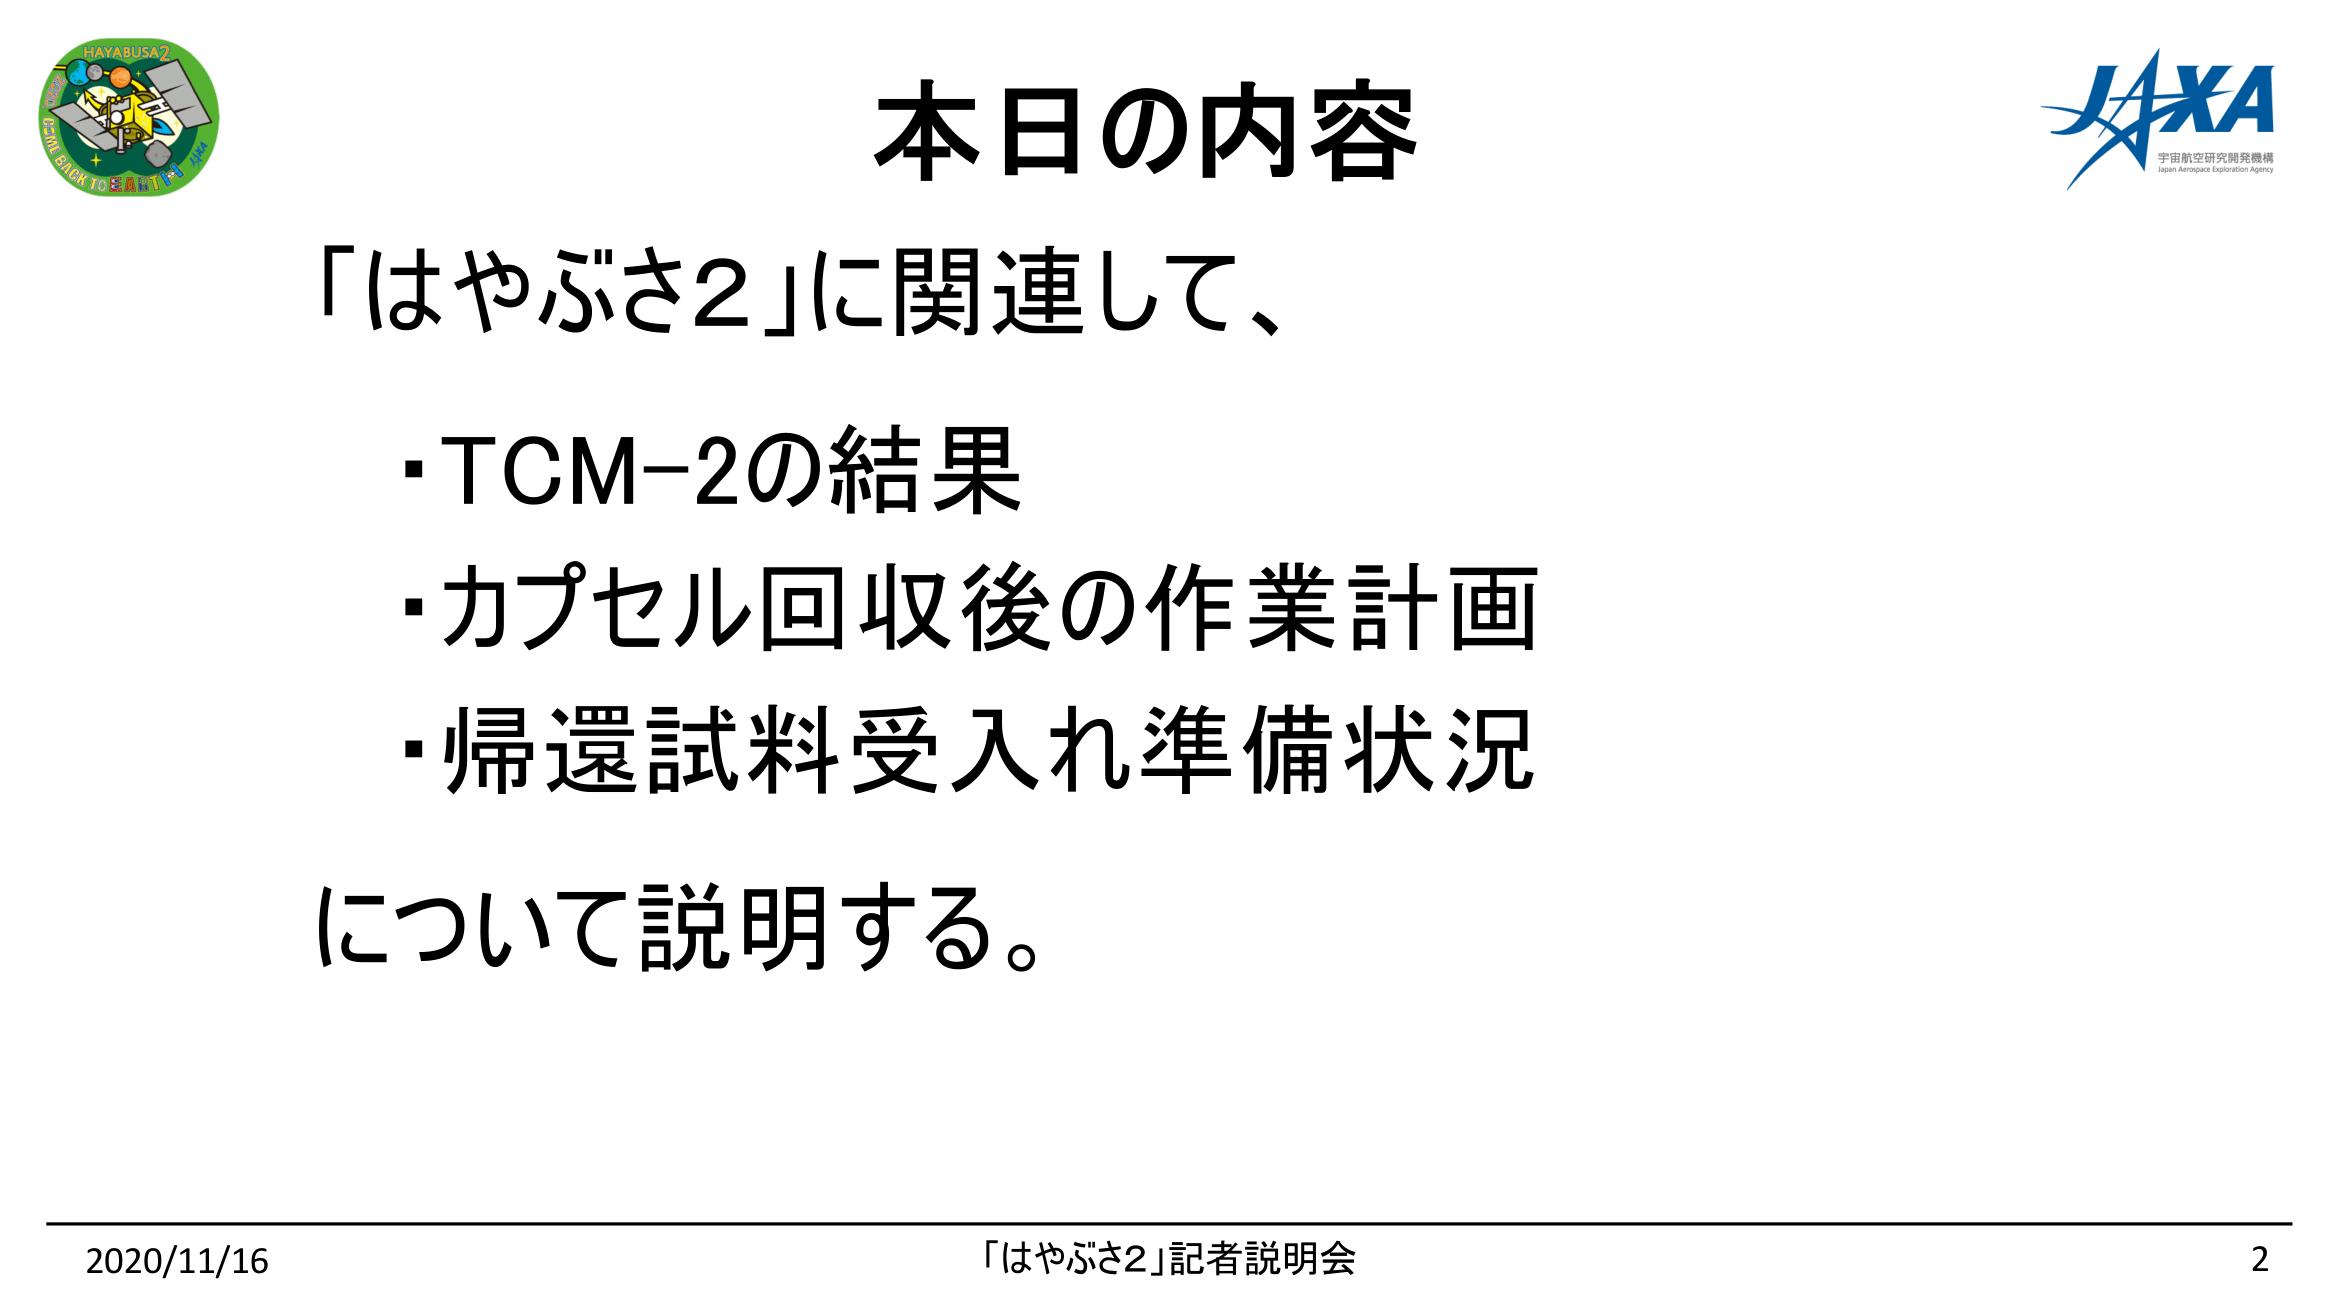 f:id:Imamura:20201116151054p:plain